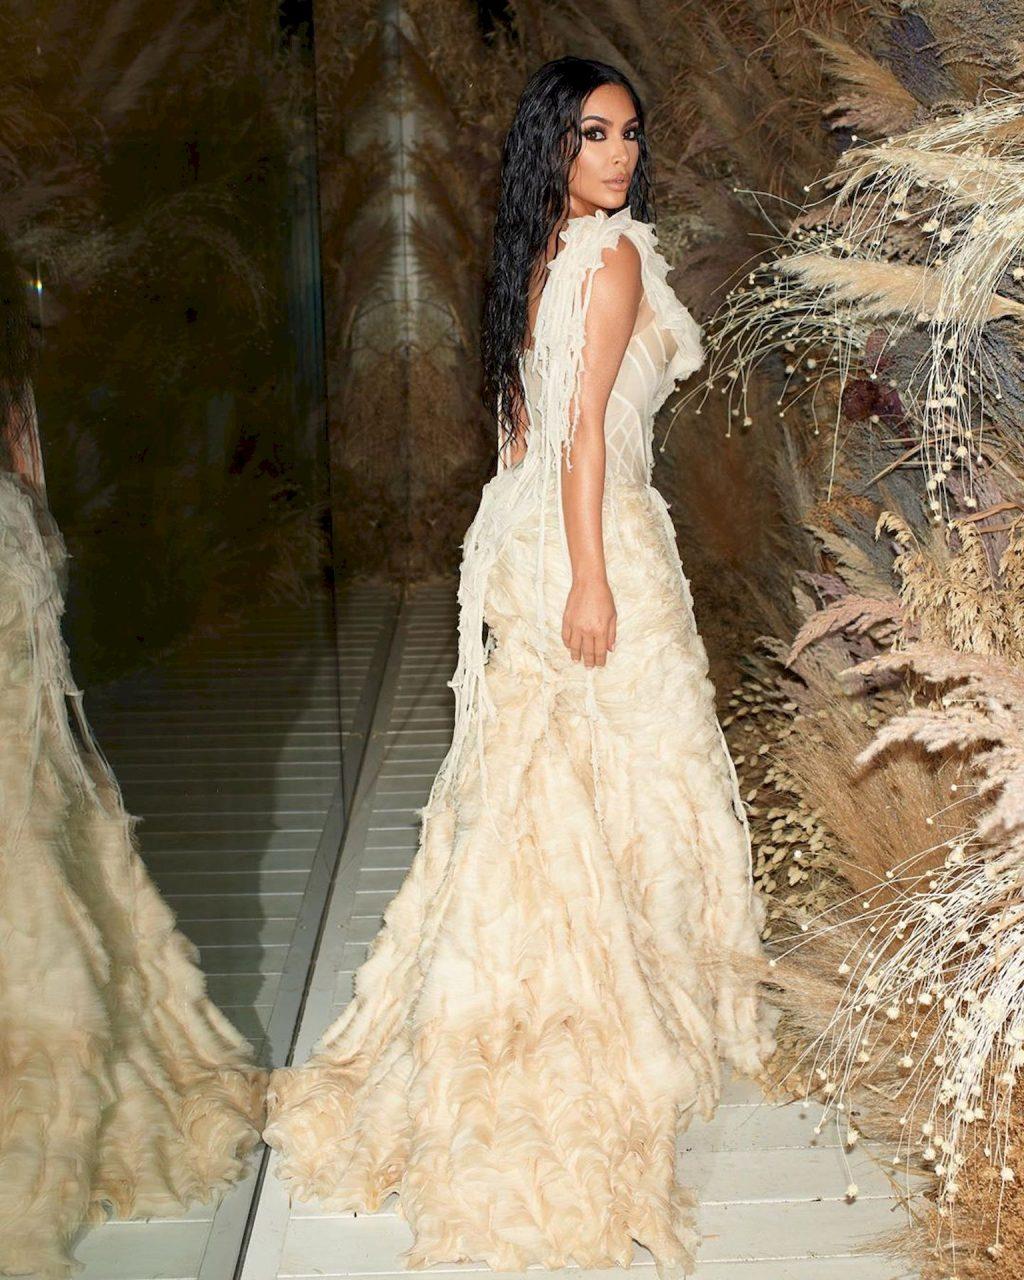 Kim Kardashian Looks Hot in a See-Through Dress at the 2020 Vanity Fair Oscar Party (17 Photos)